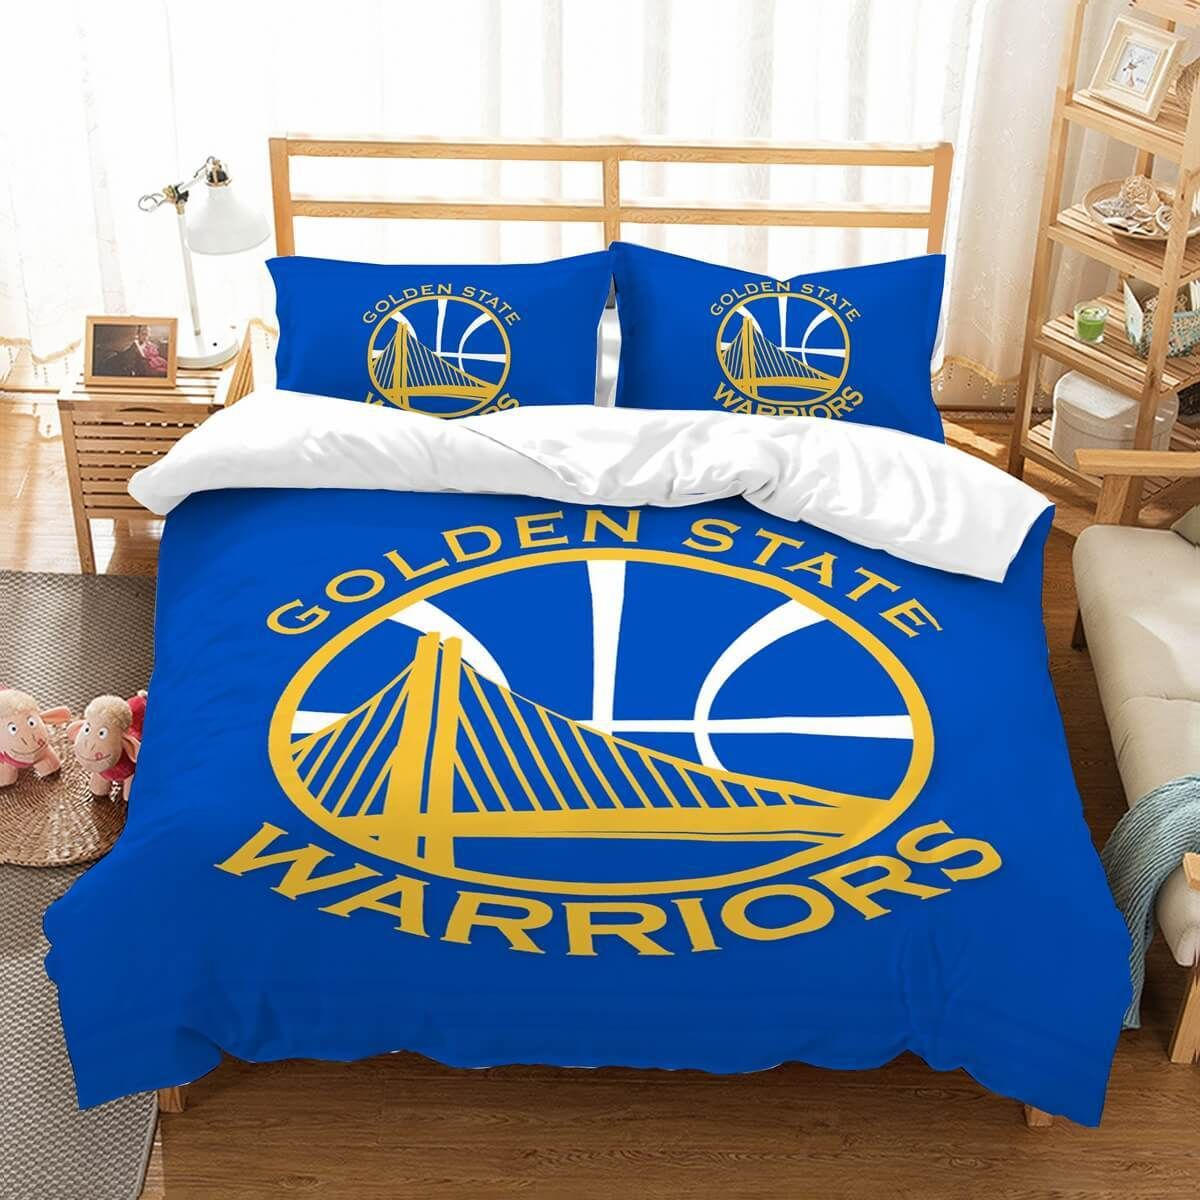 Golden State Warriors Bedding